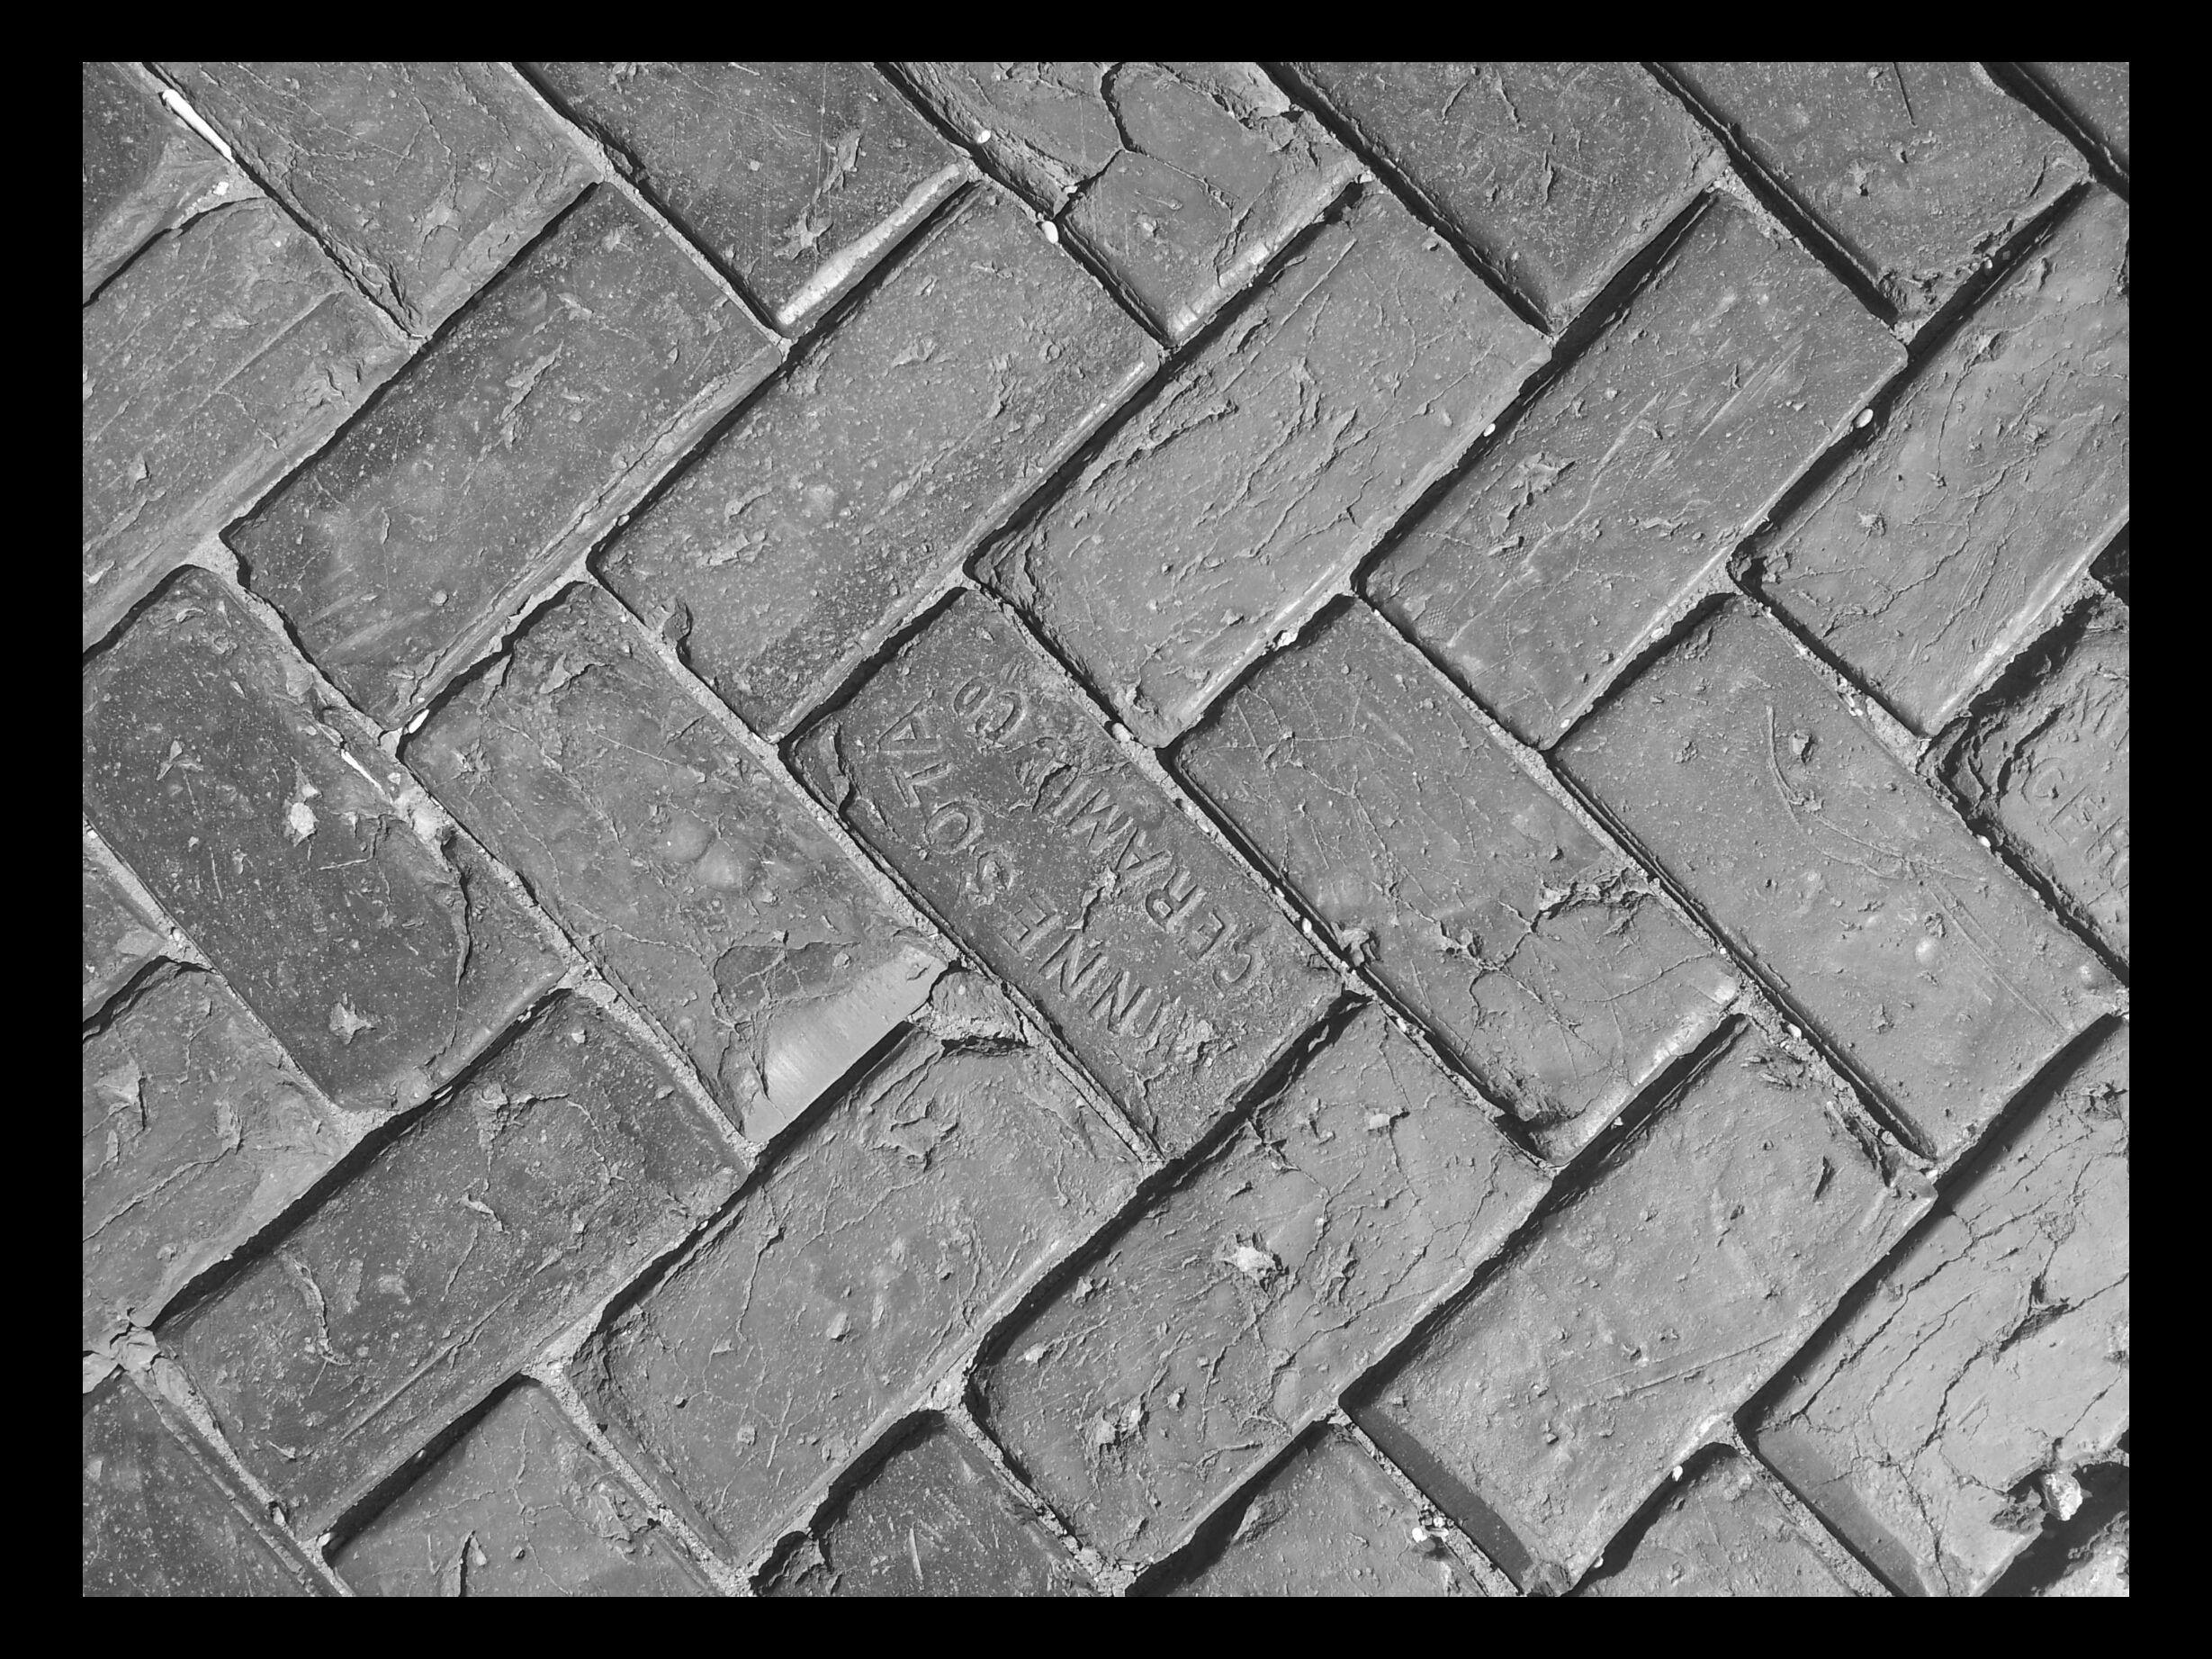 Brick Sidewalk At Rugby Nd Train Station Brick Sidewalk Brick Sidewalk